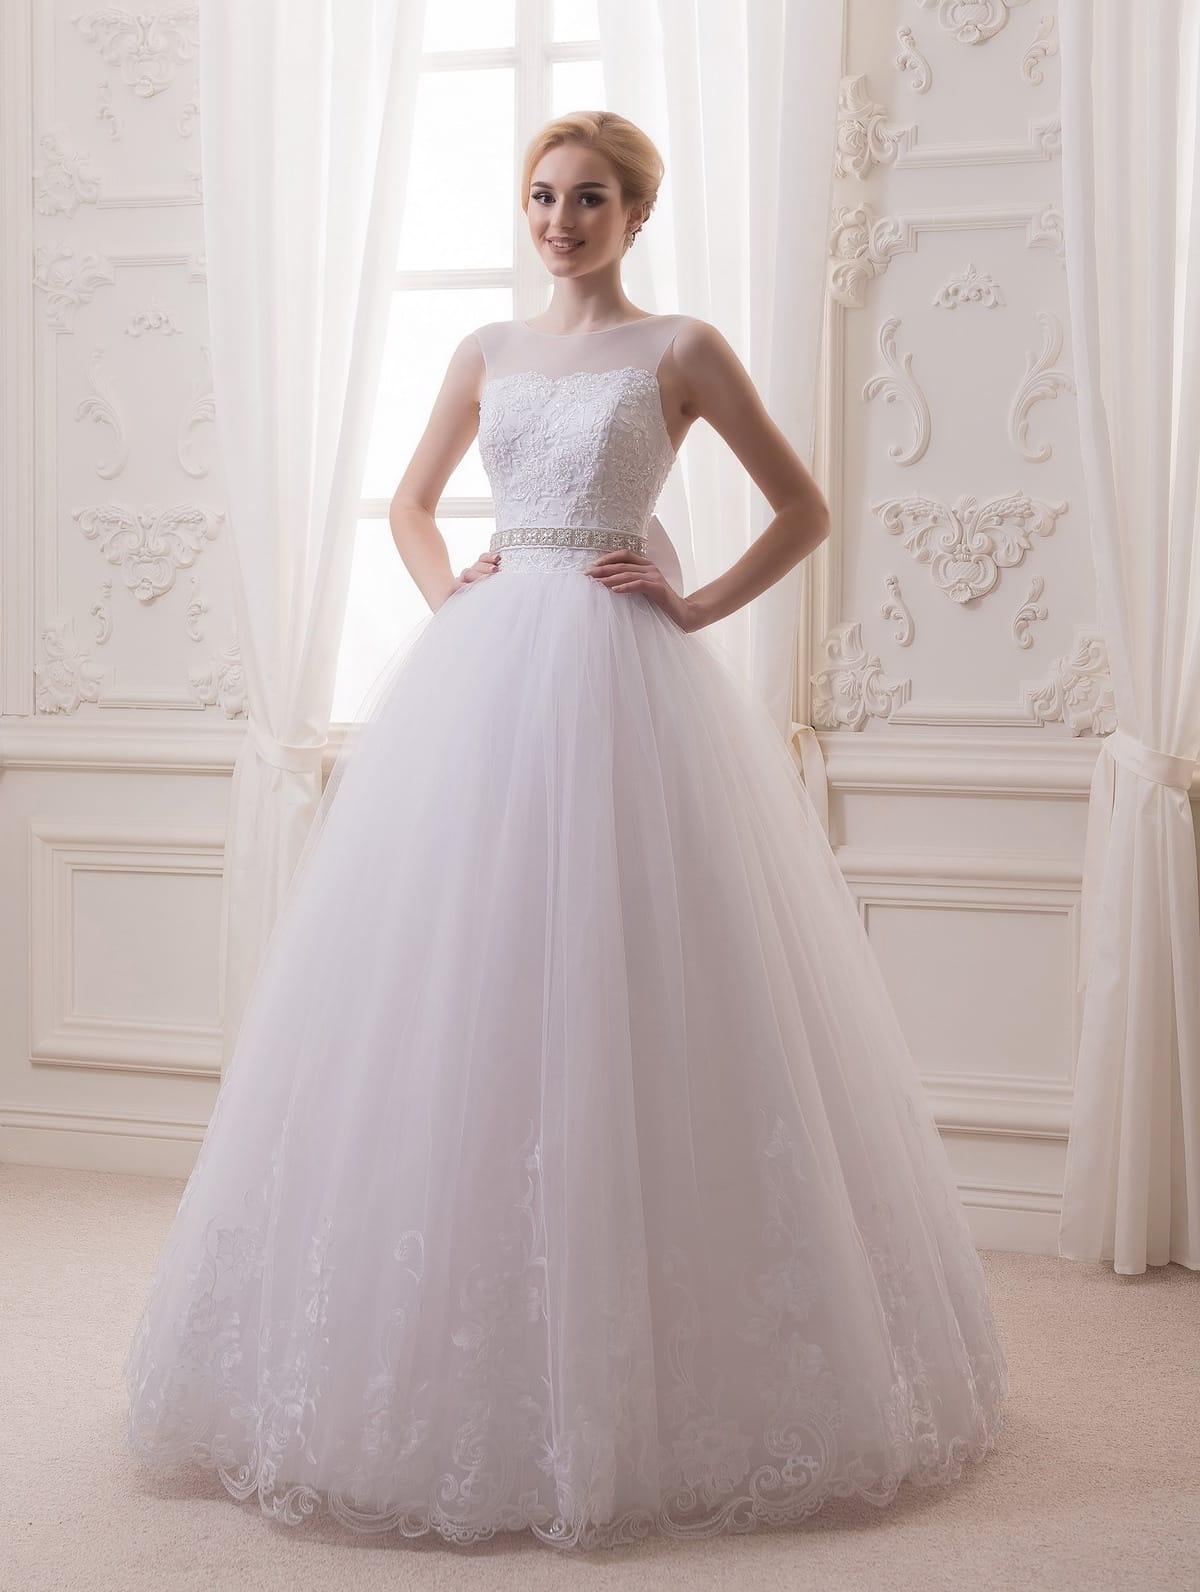 sale retailer d356f 4d9da Cyra abiti da sposa prezzi bassi online